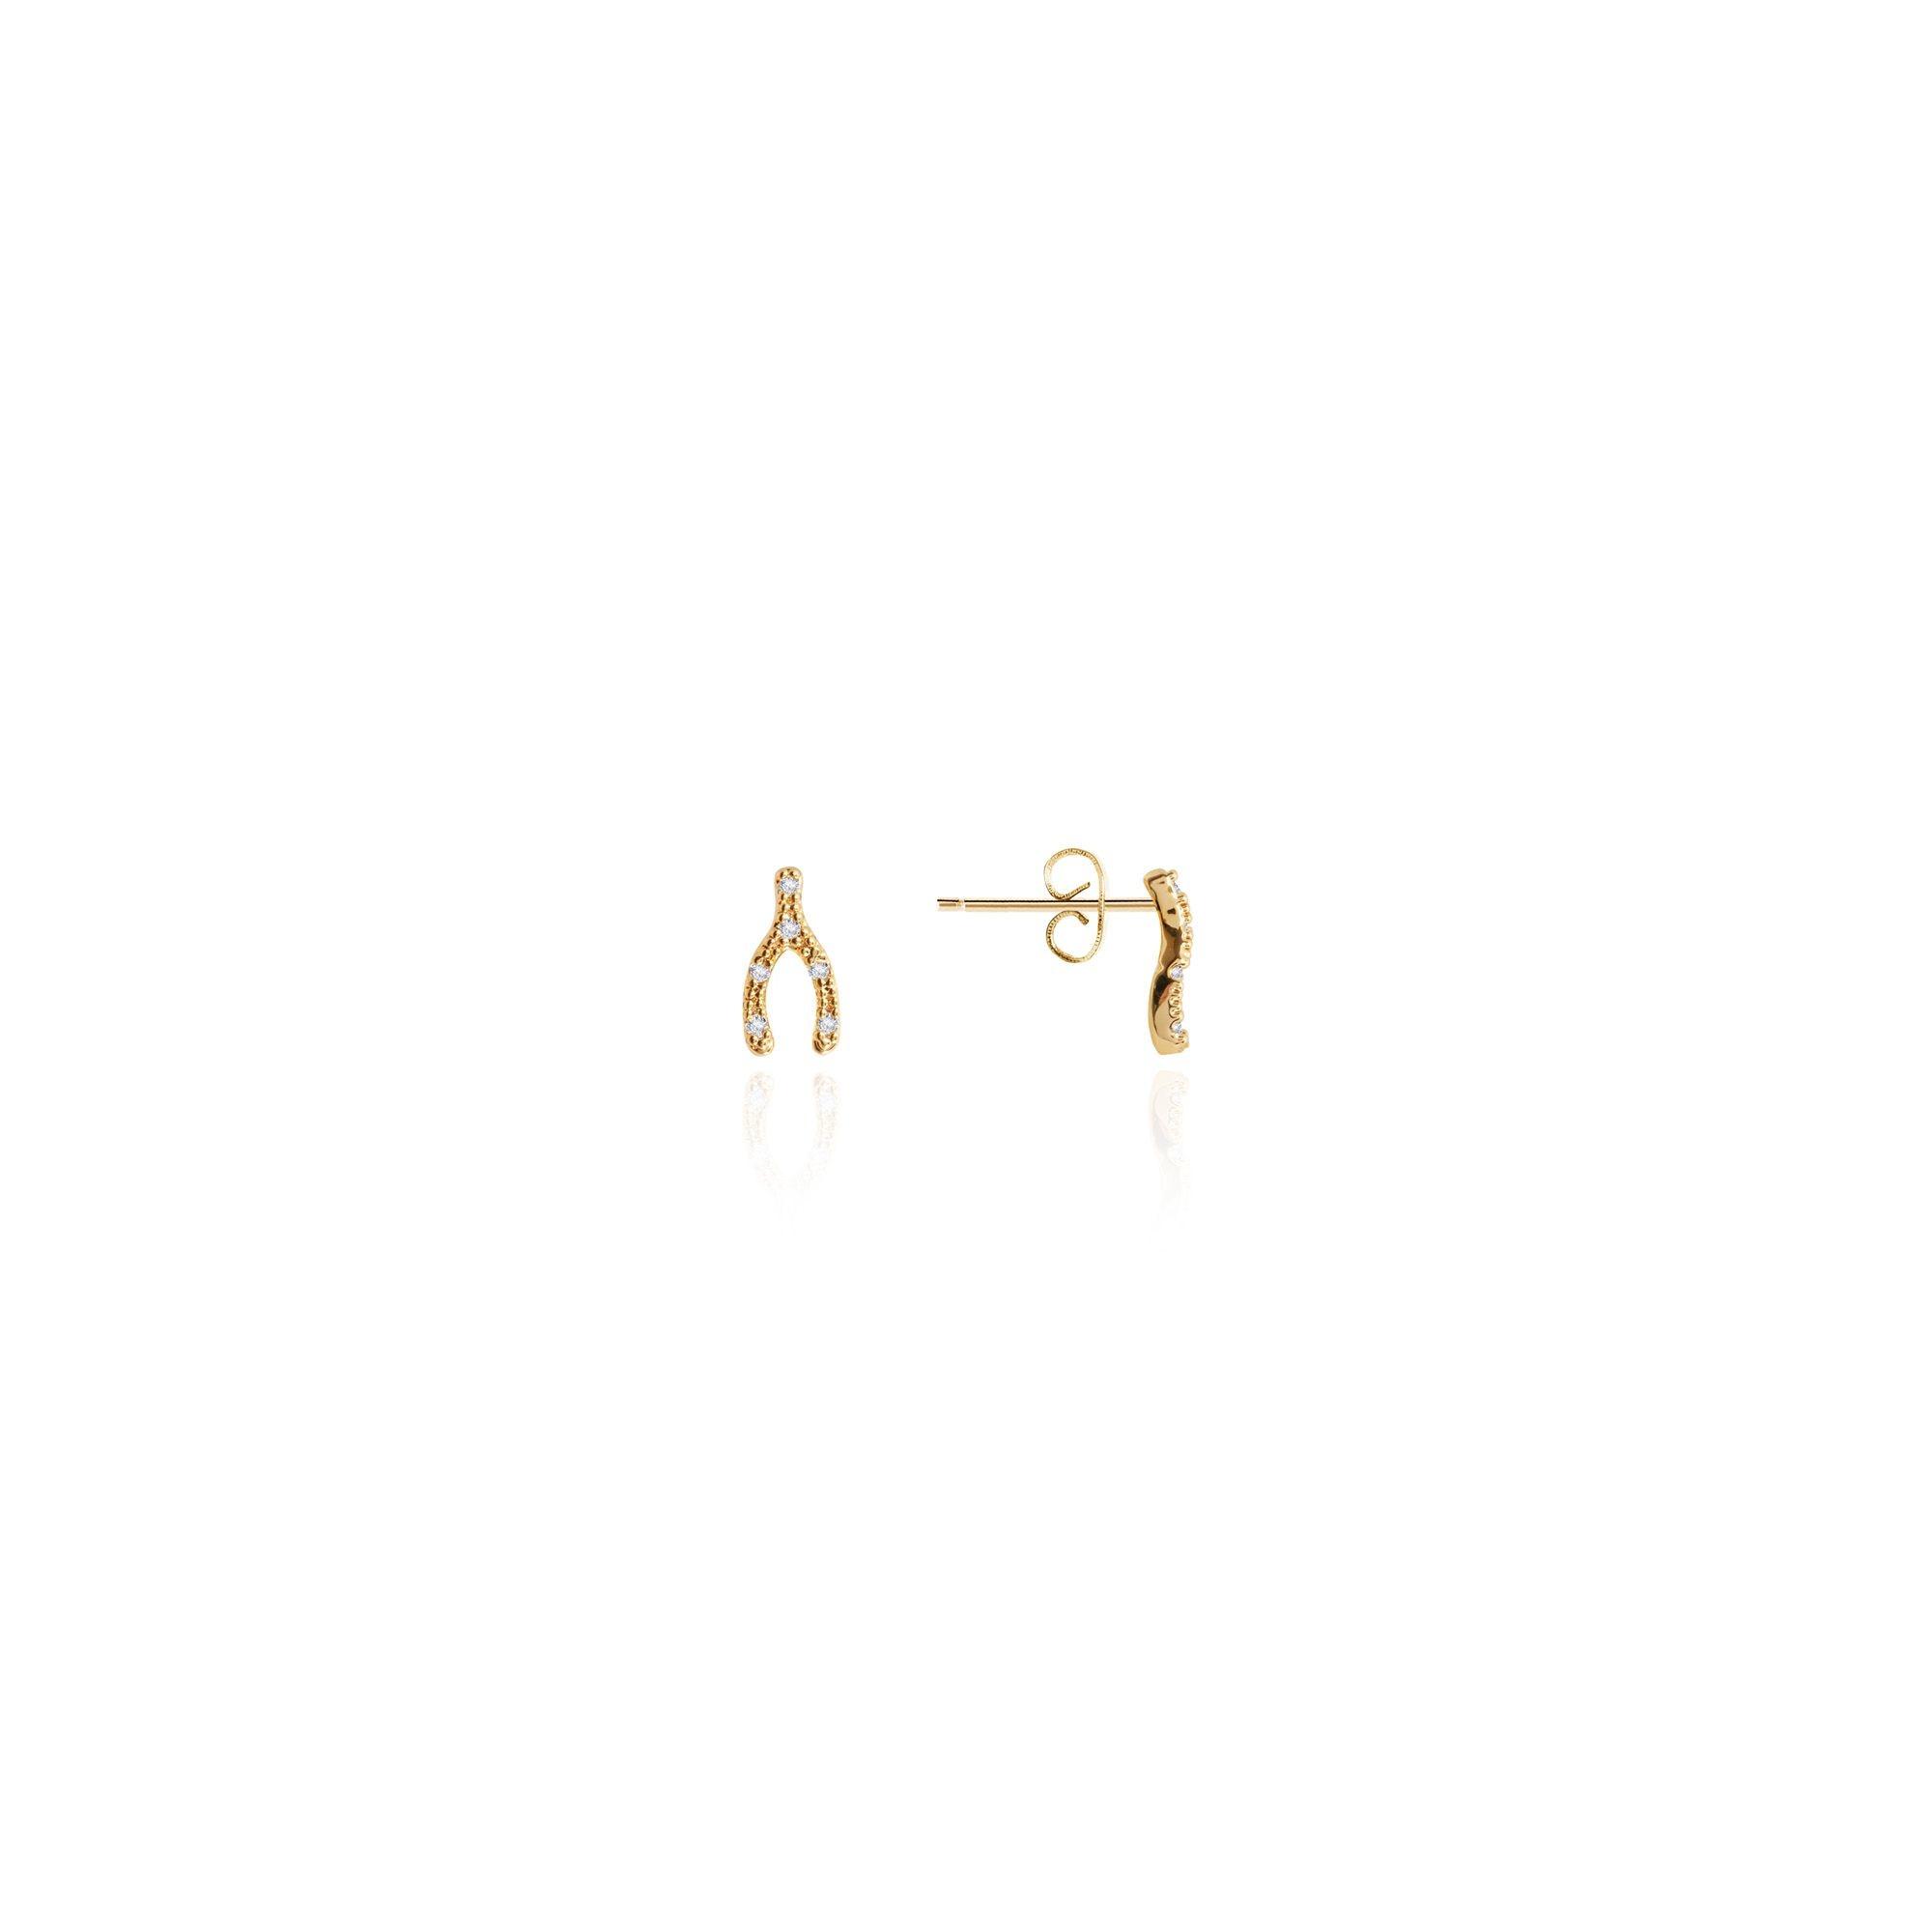 Joma Jewellery Juwelenset - Make a Wish - Ketting & Oorbellen Goud